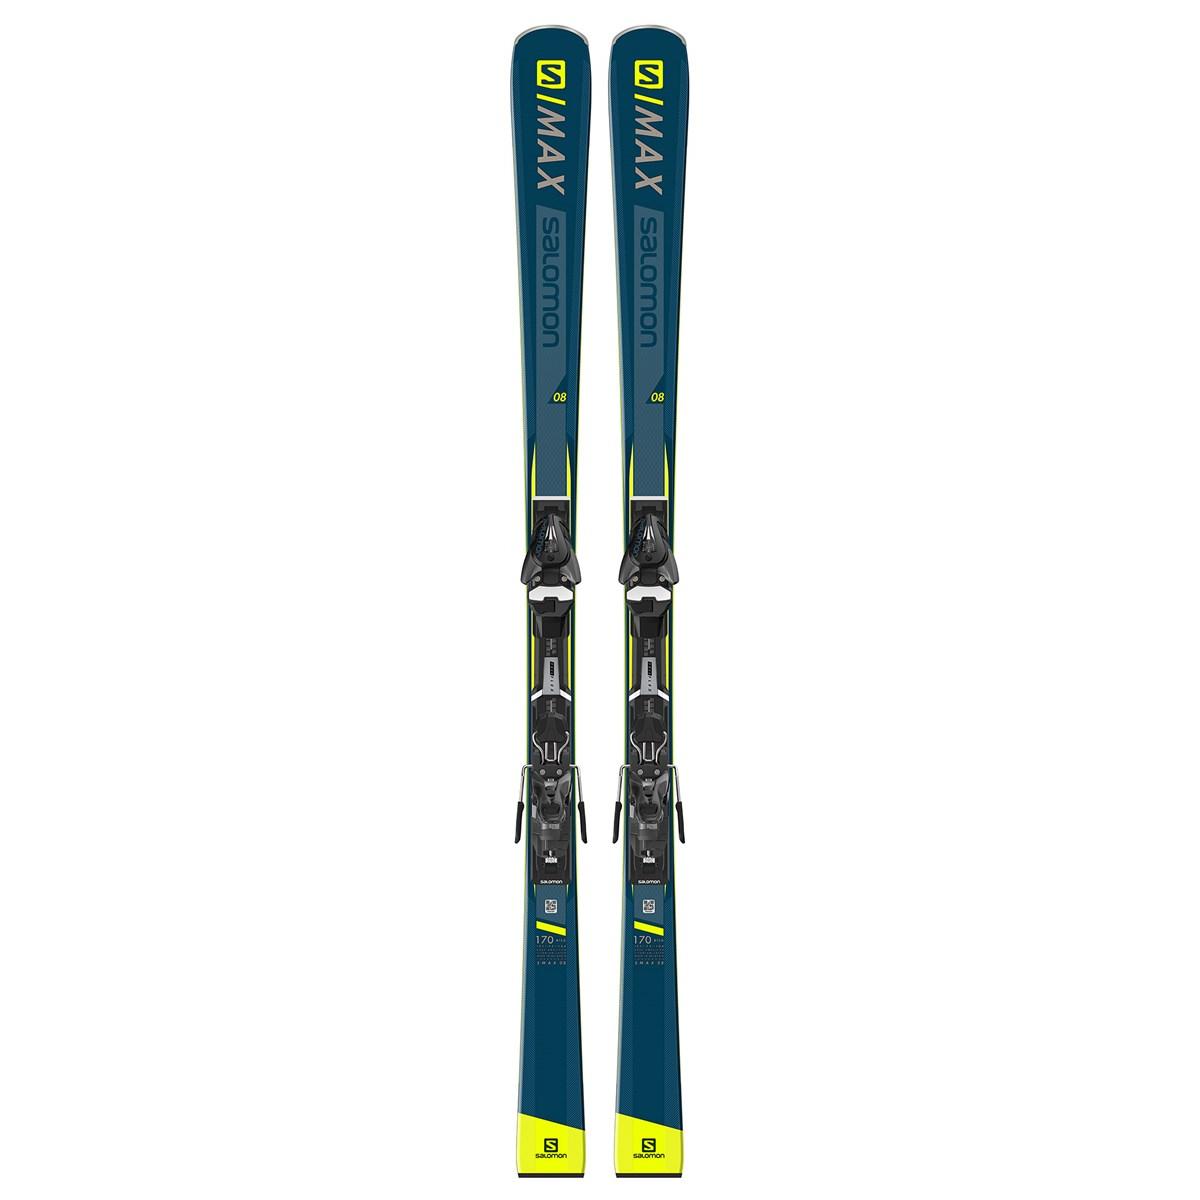 232c0c37 Salomon S/Max 8 Mens 2019 Piste Skis with Mercury 11 Bindings